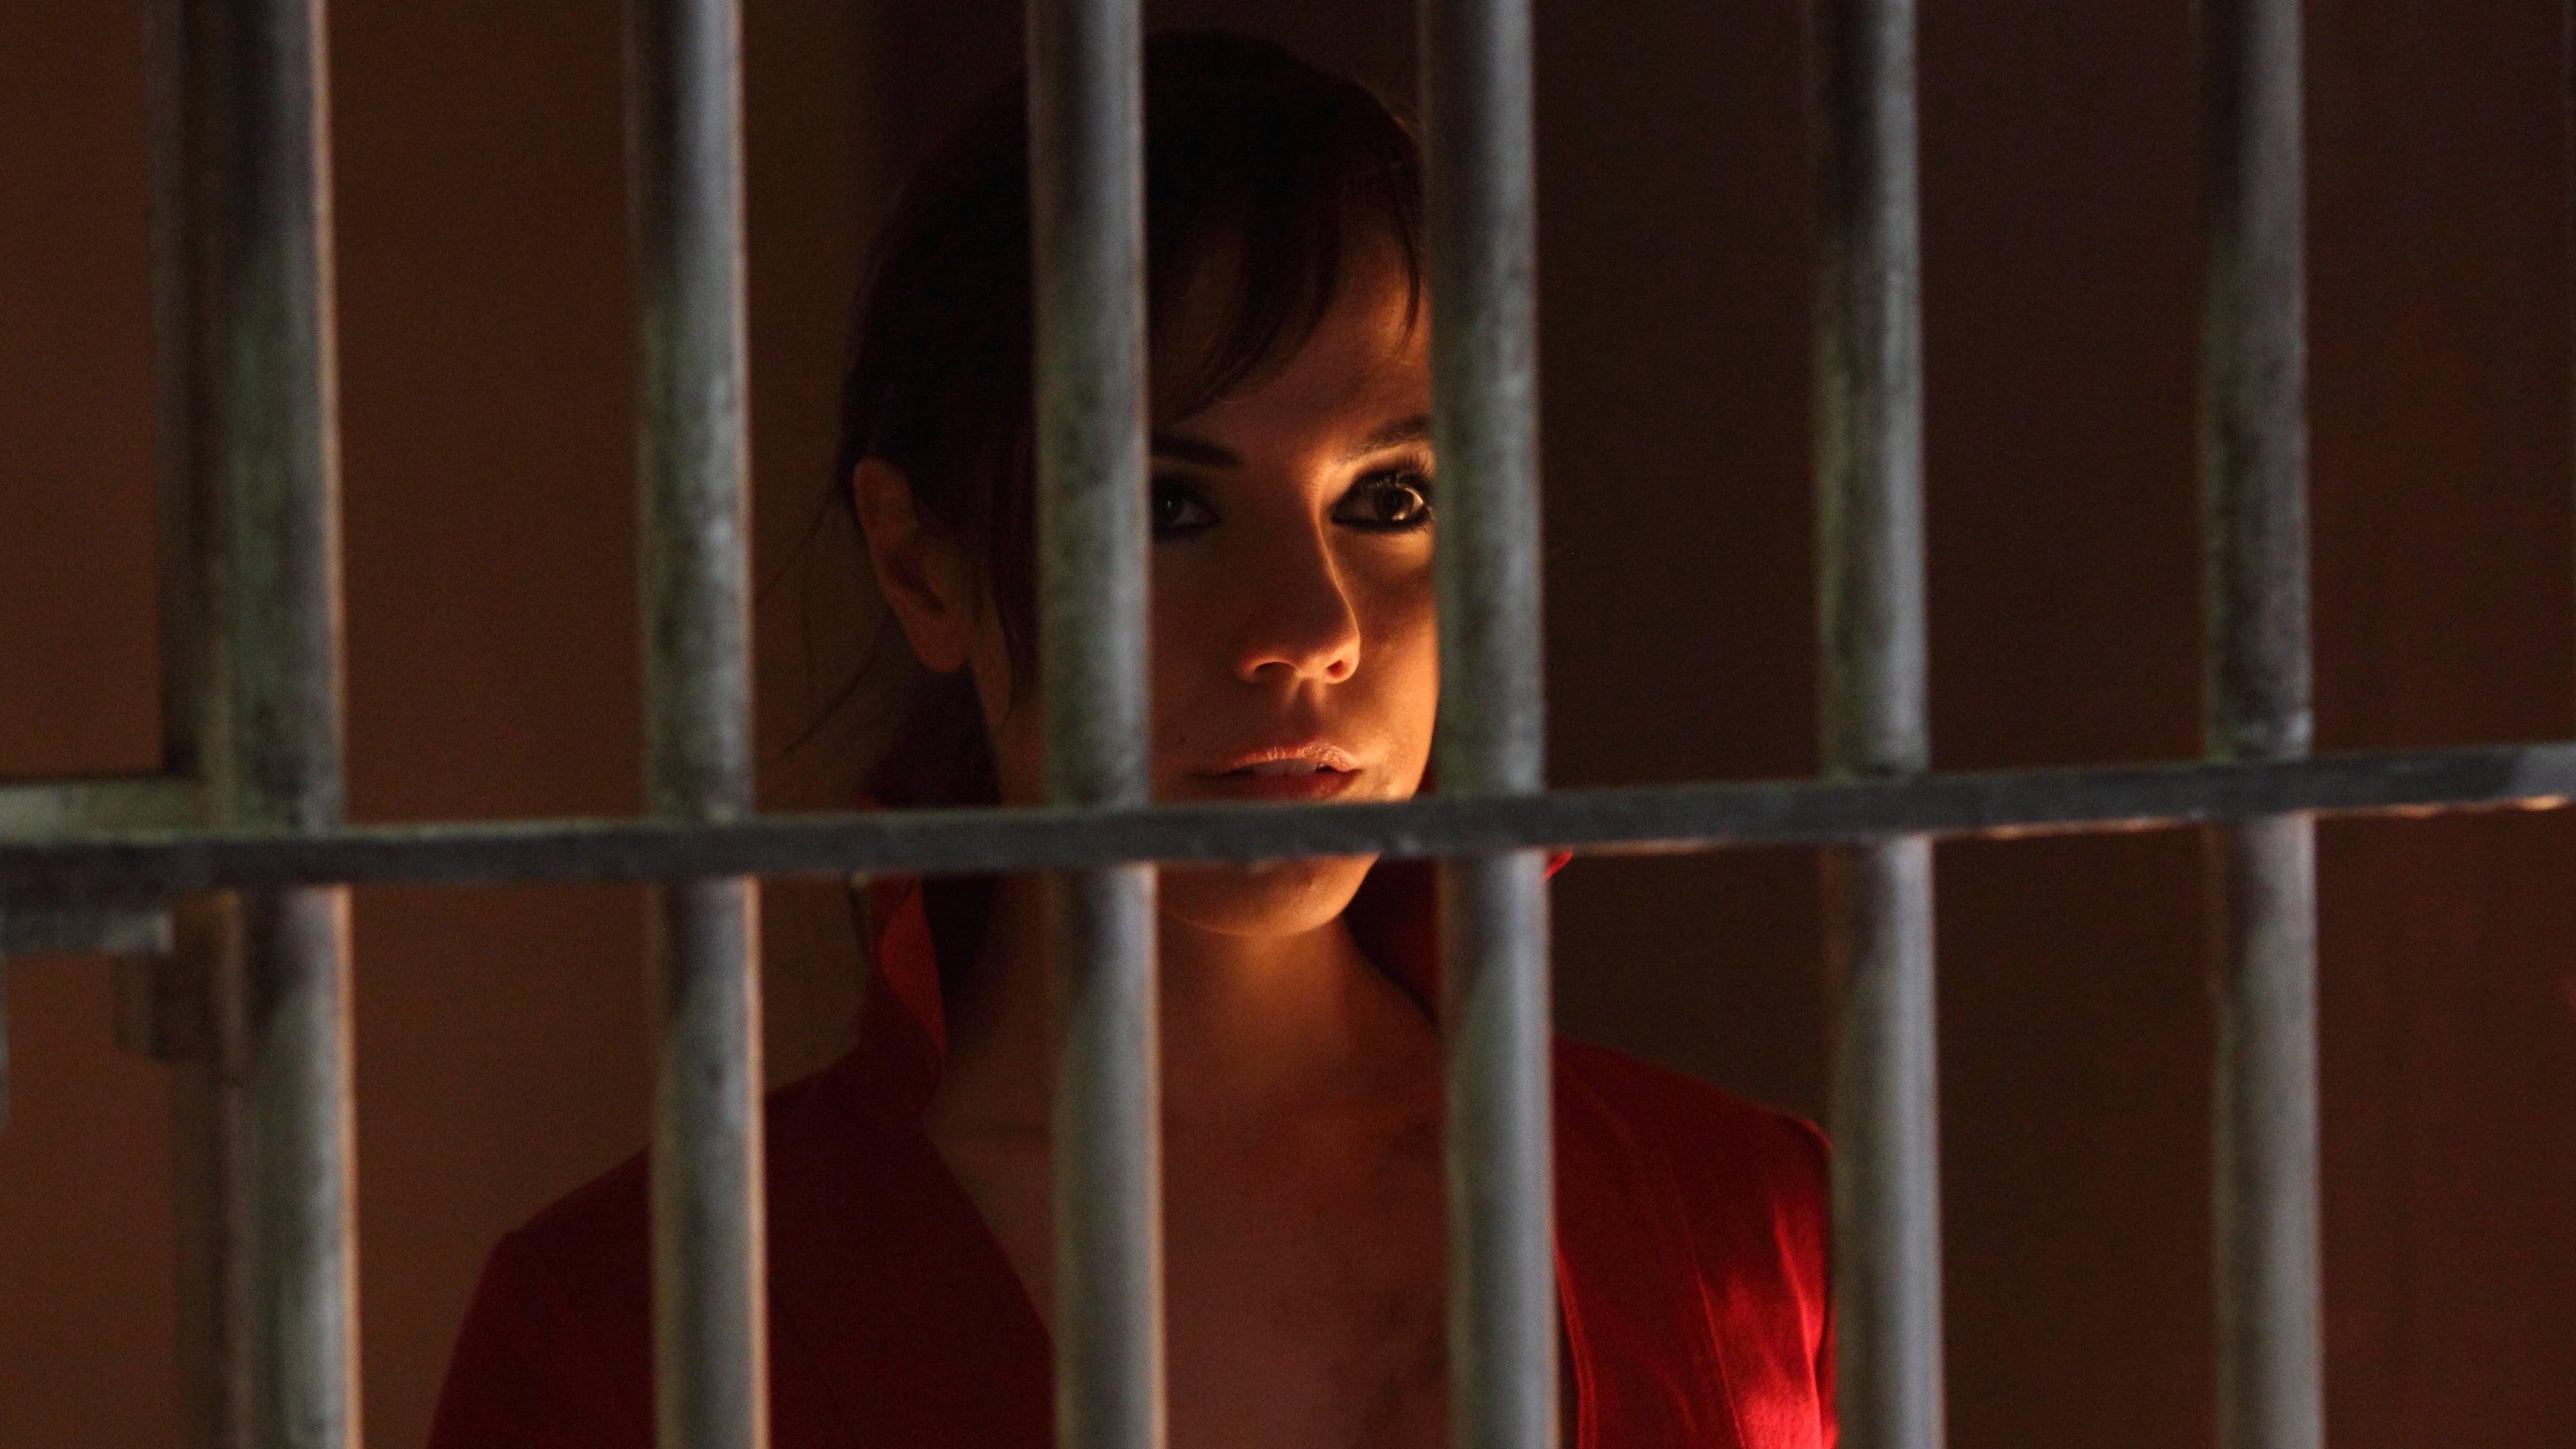 Lost Girl: Season 3 Episode 1 S03E01 OPENLOAD Free Full Episode